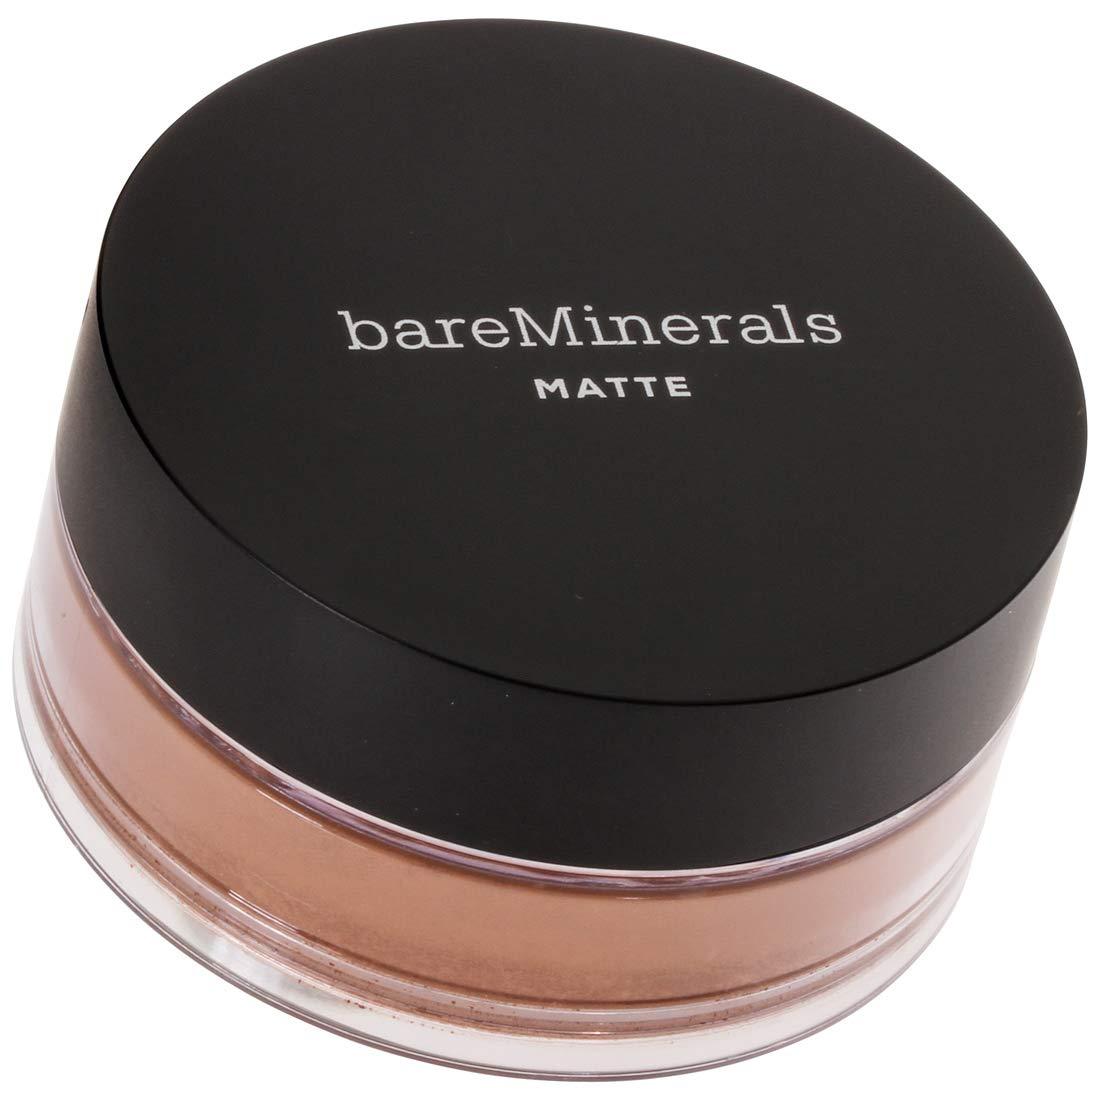 BareMinerals Loose Powder Matte Foundation SPF 15 0.21 oz Deepest Deep